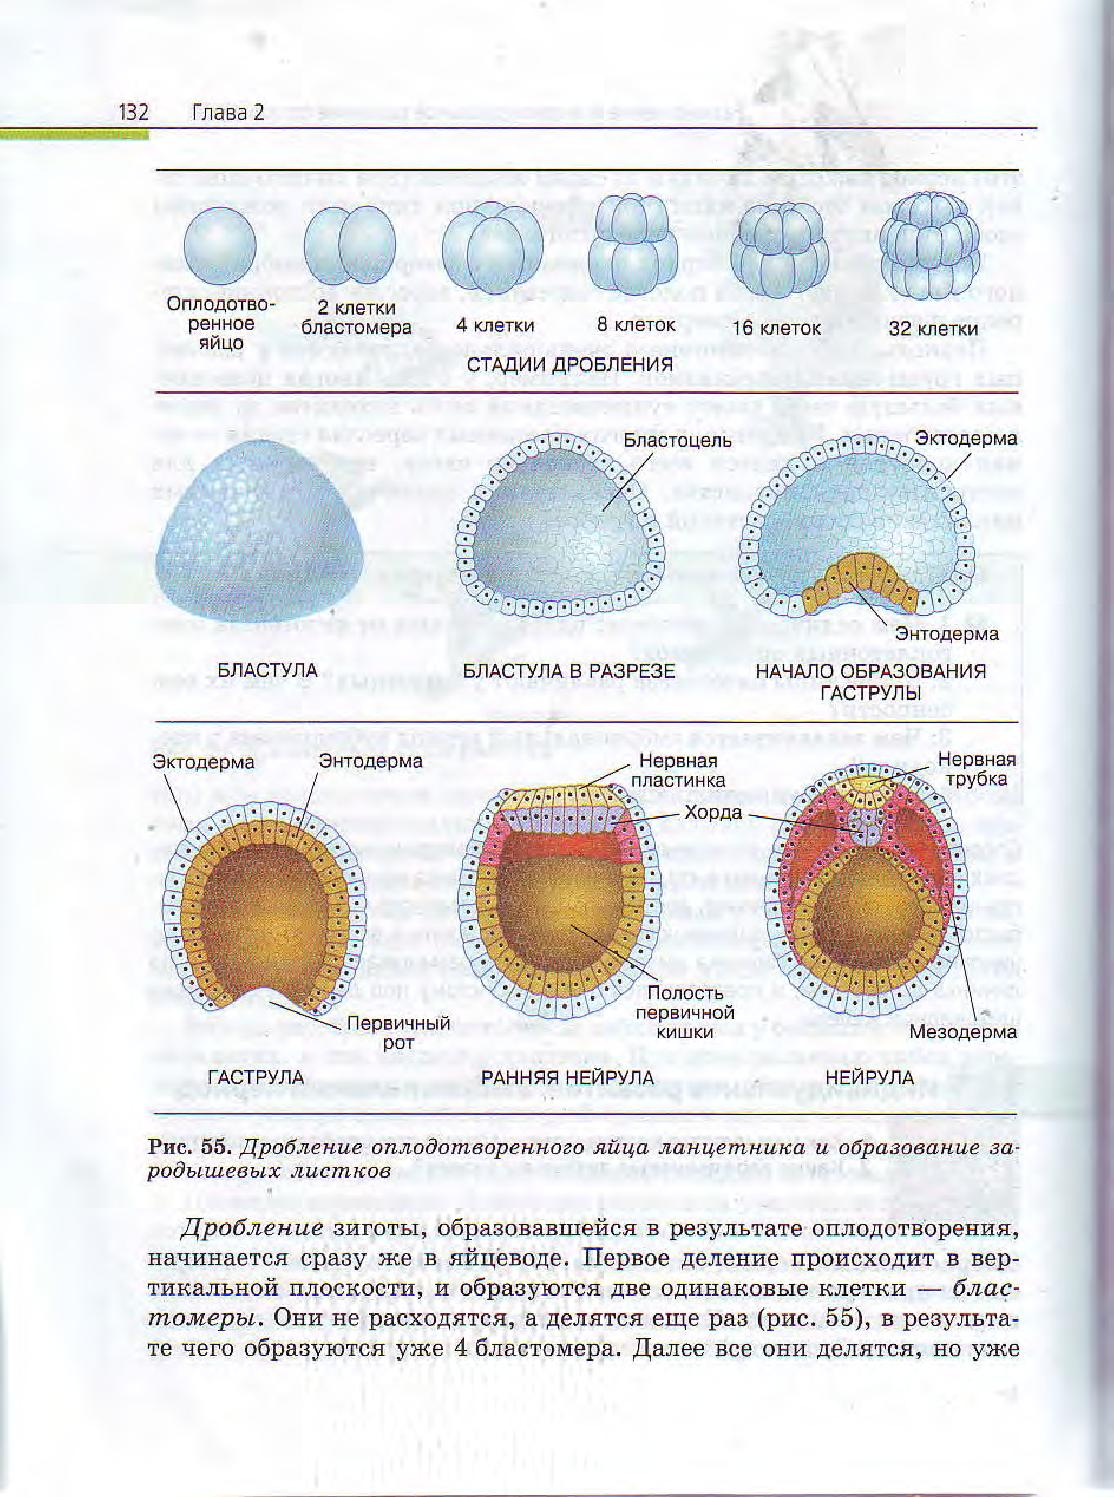 Схема внутриутробного развития